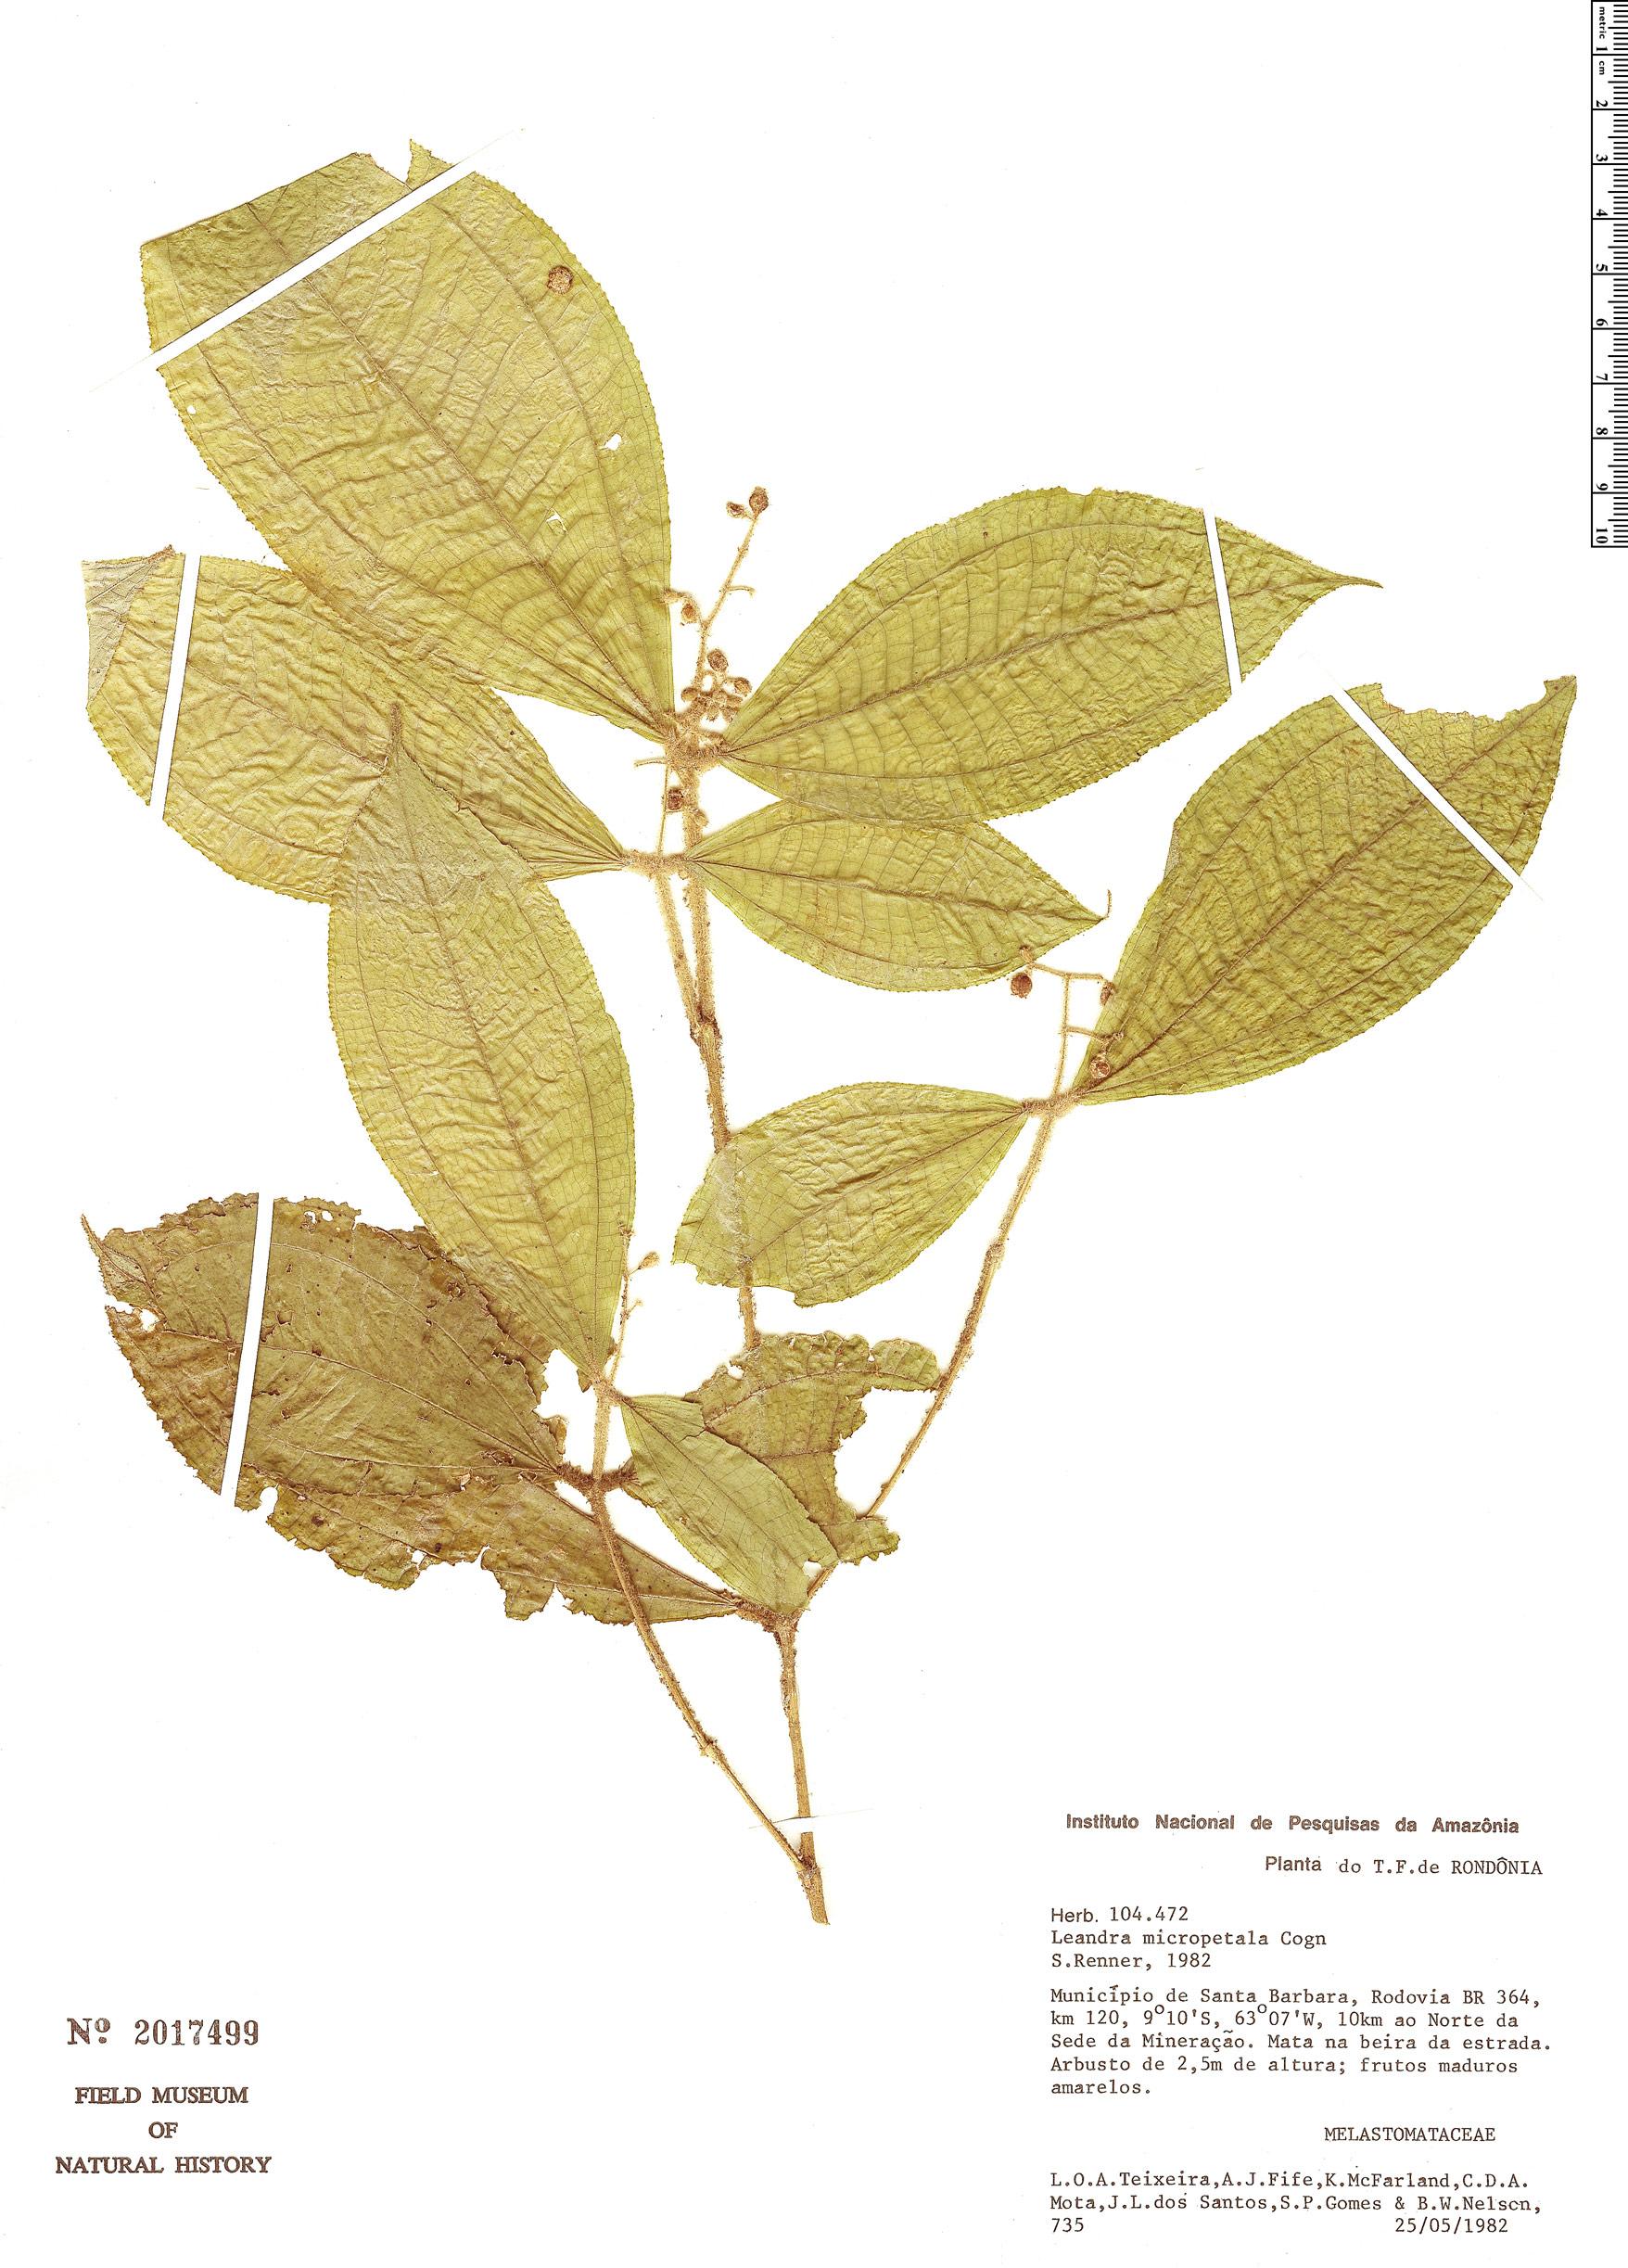 Espécime: Leandra micropetala